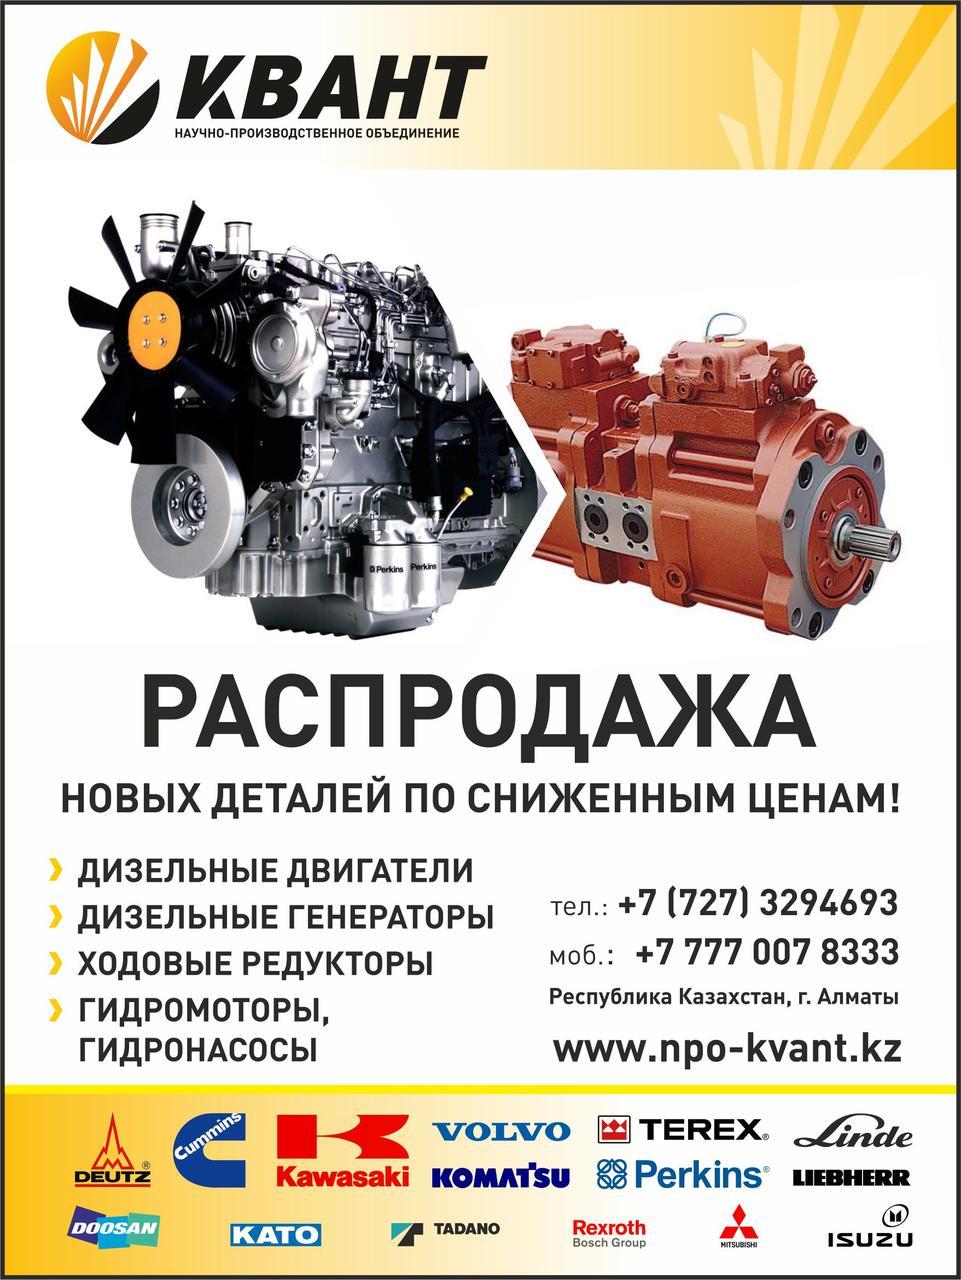 Двигатель MTU 12V 4000 C13R, MTU 12V 4000 C11R, MTU 12V 4000 C11, MTU 12V 4000 C13, MTU 12V 4000 C21R